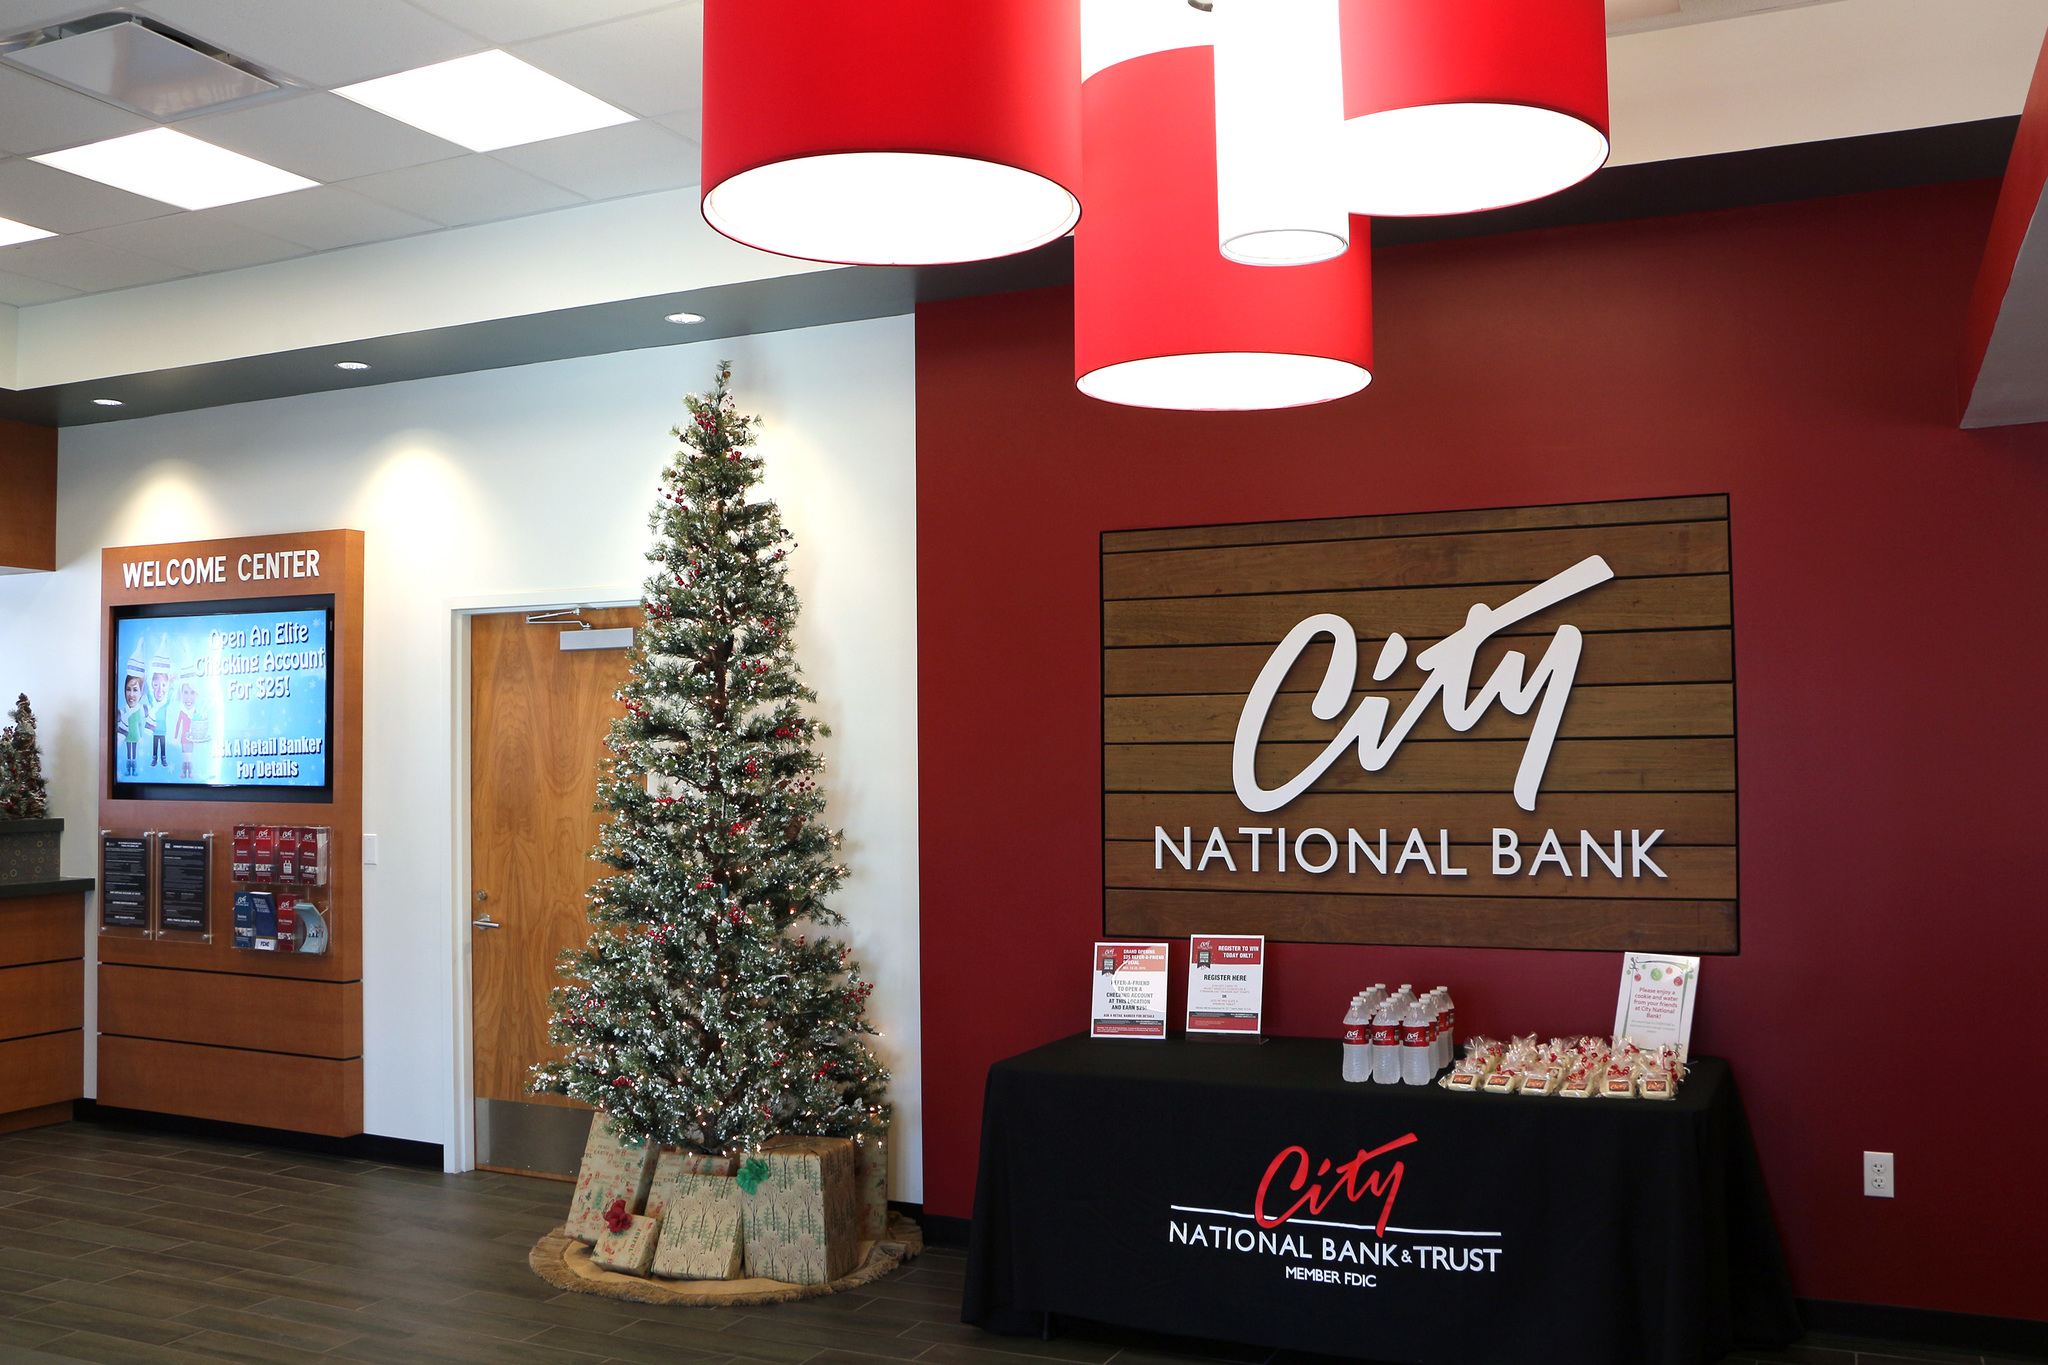 City National Bank & Trust ATM - Lawton, OK